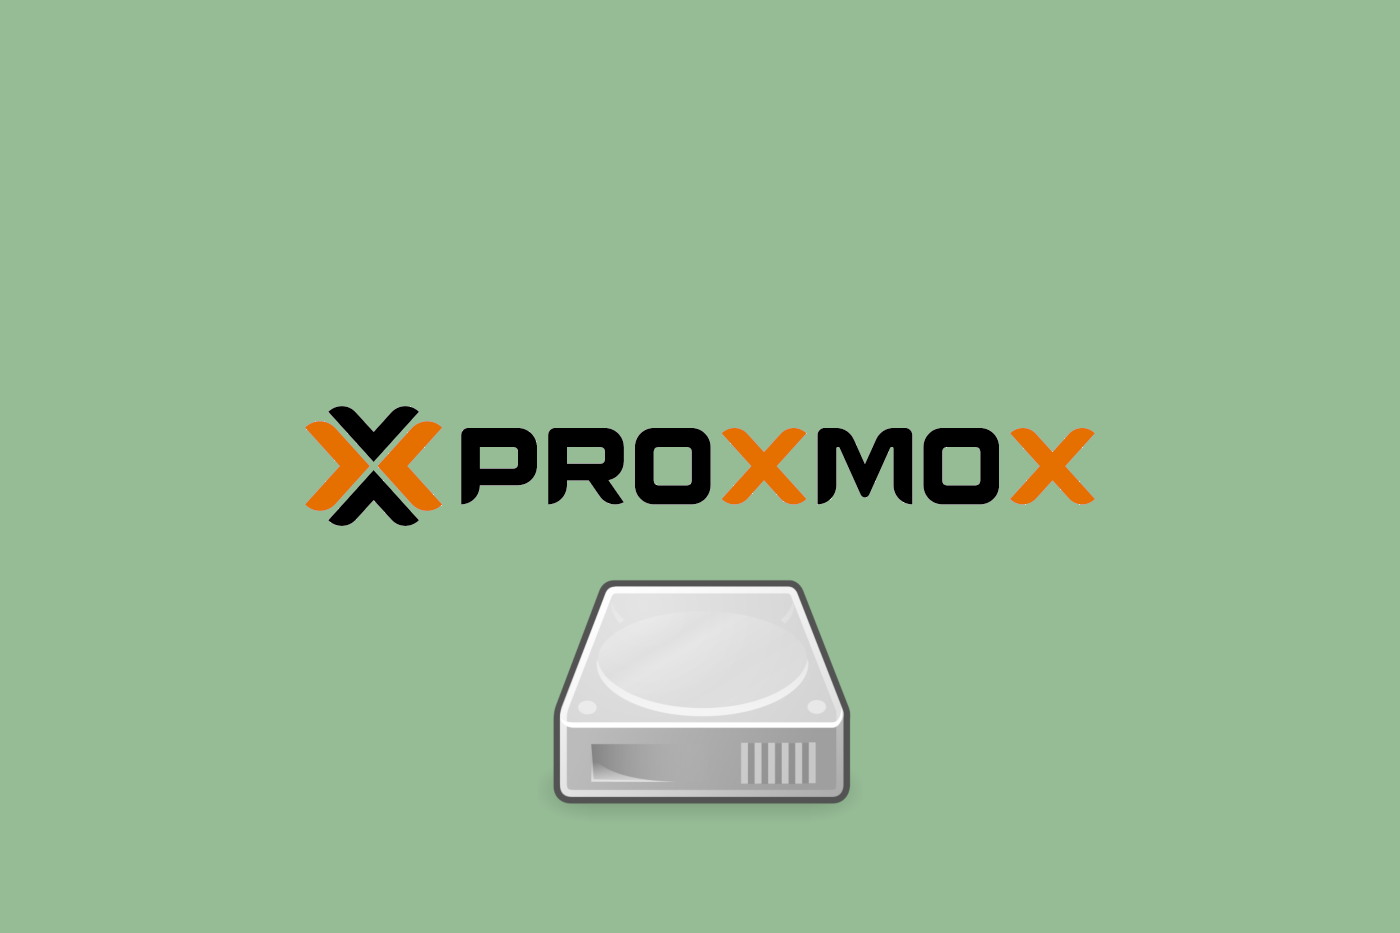 Proxmox - LVM SSD-Backed Cache